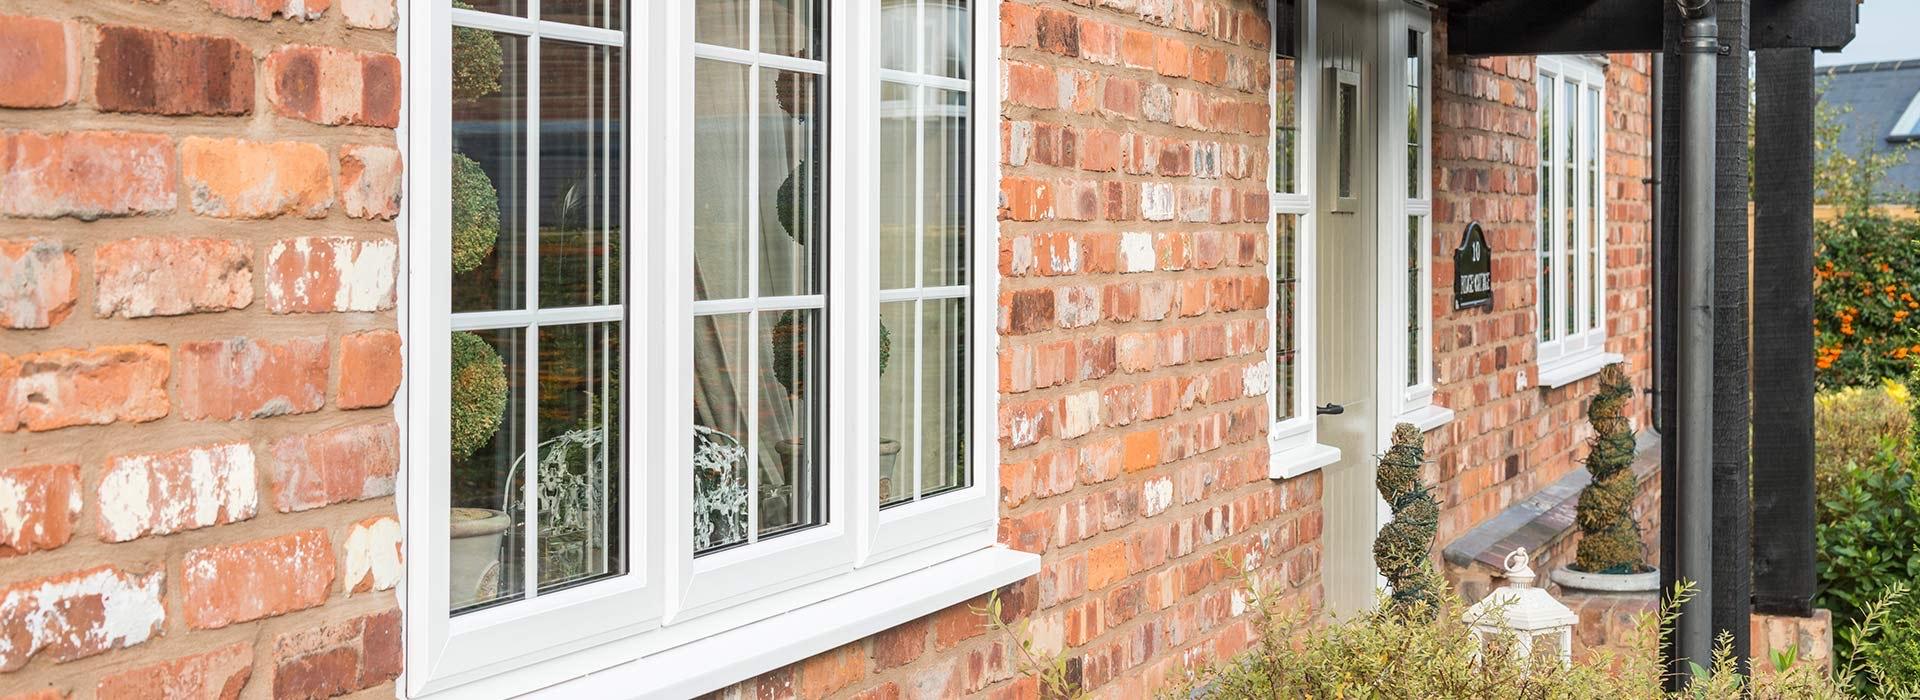 Upvc windows dartford double glazing sidcup kent for Upvc double glazing